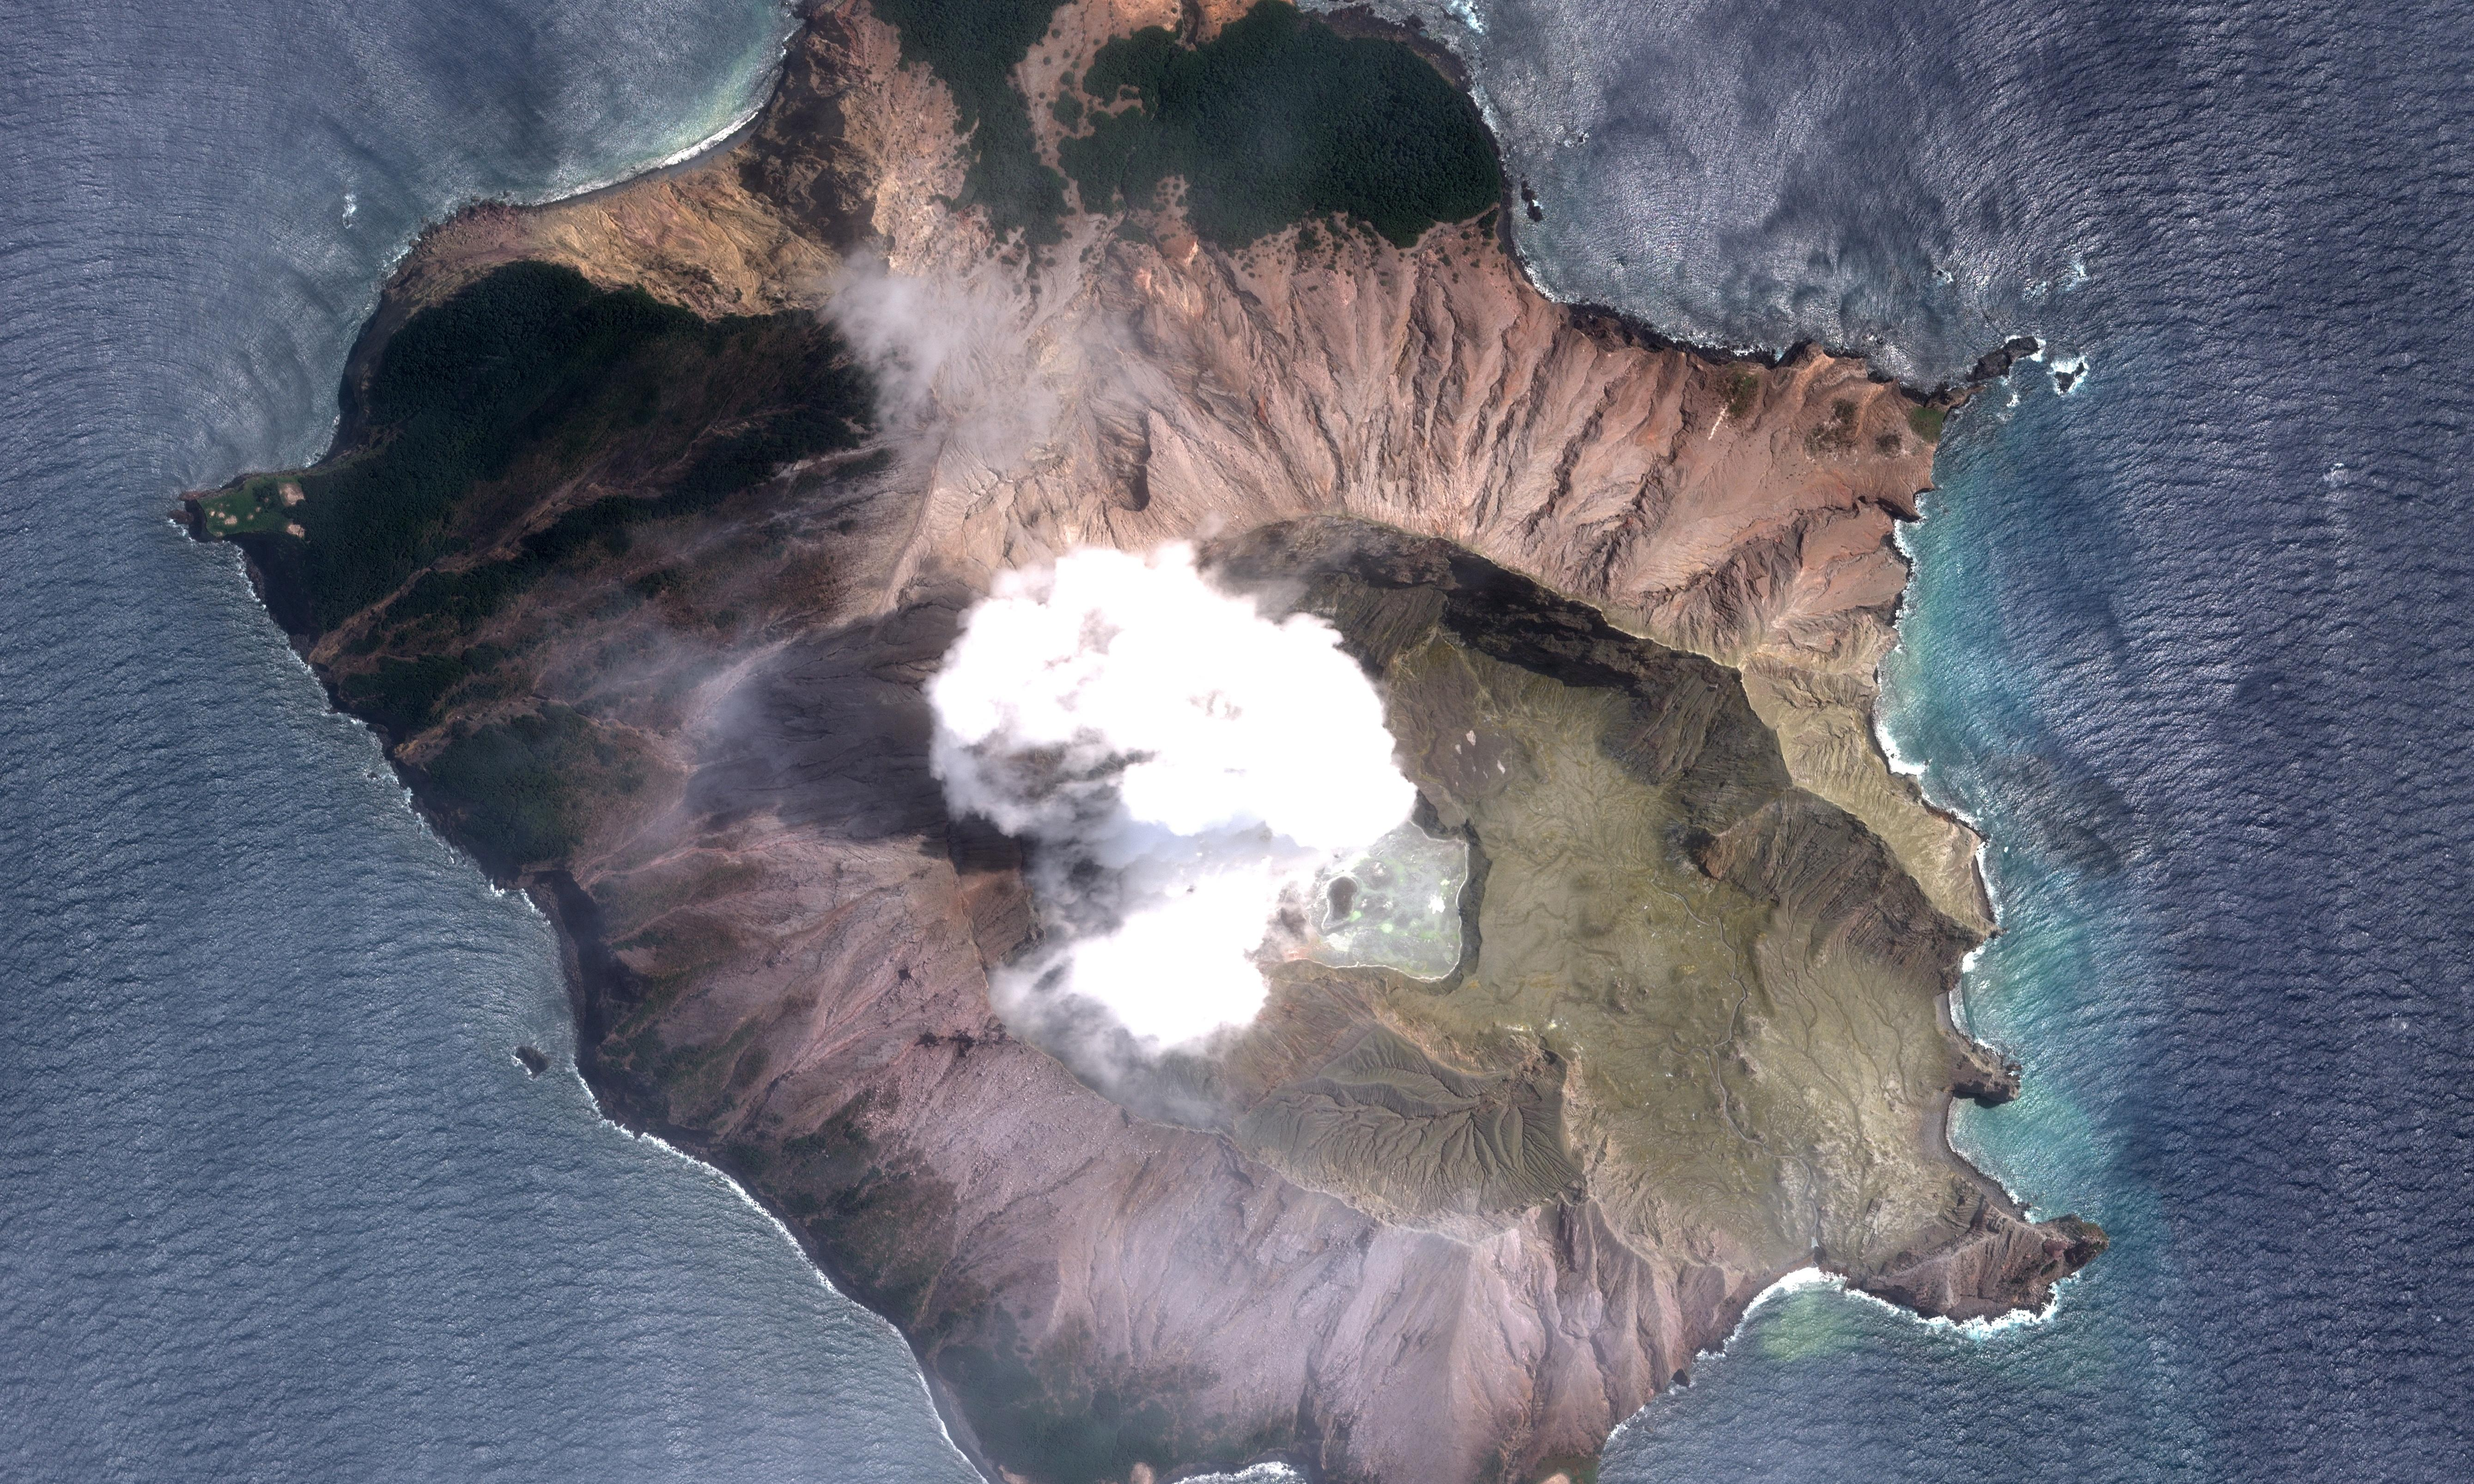 New Zealand volcano: police may do rushed body retrieval despite eruption risk